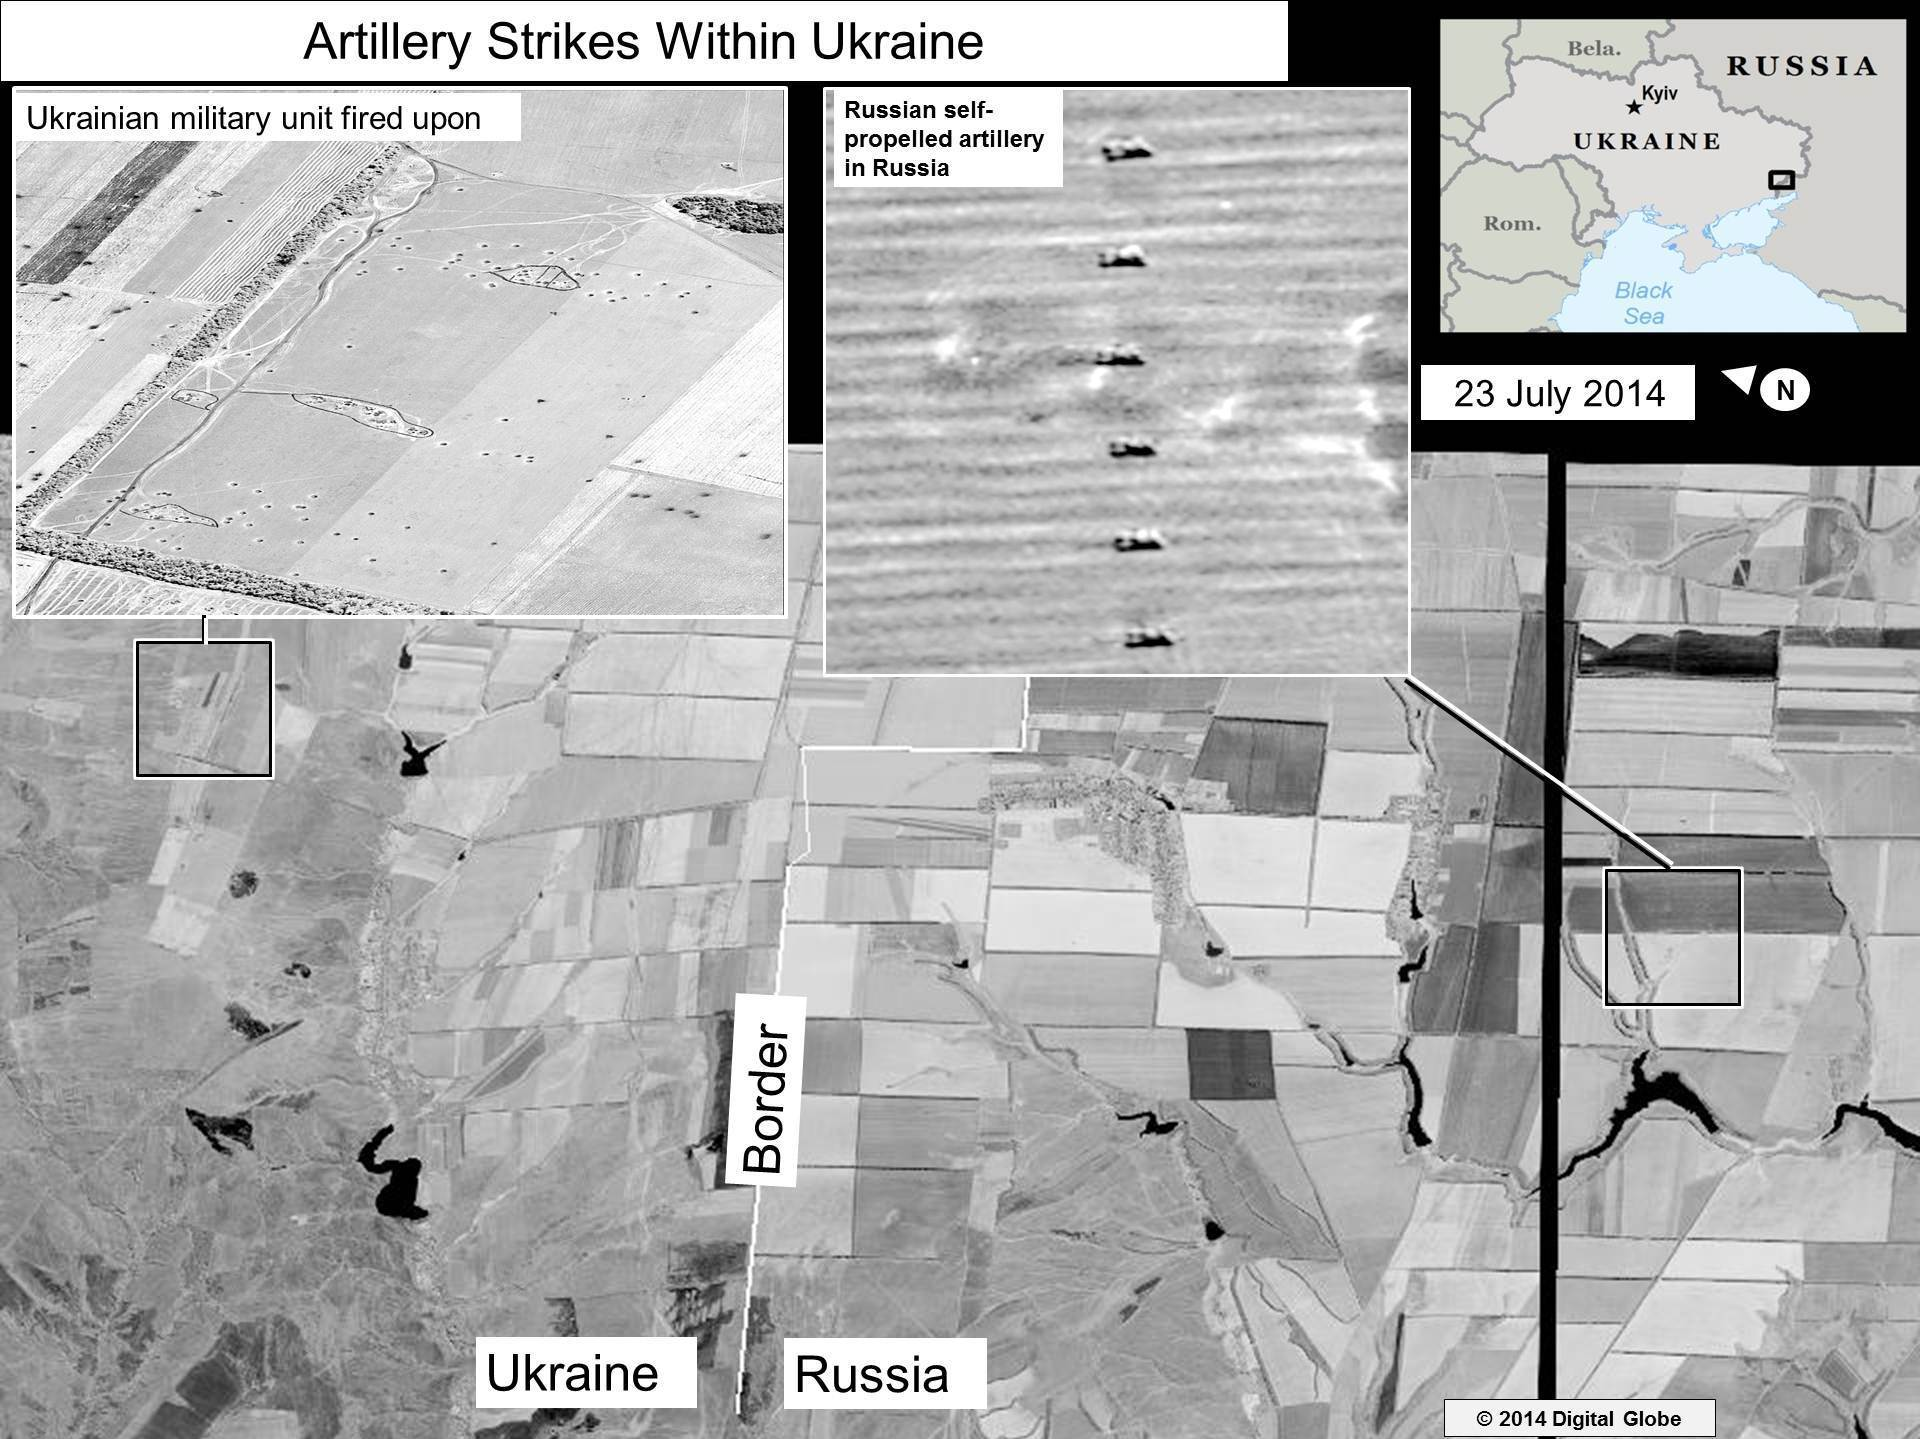 U.S.: Satellite Images Show Russian Rockets Hitting Ukraine